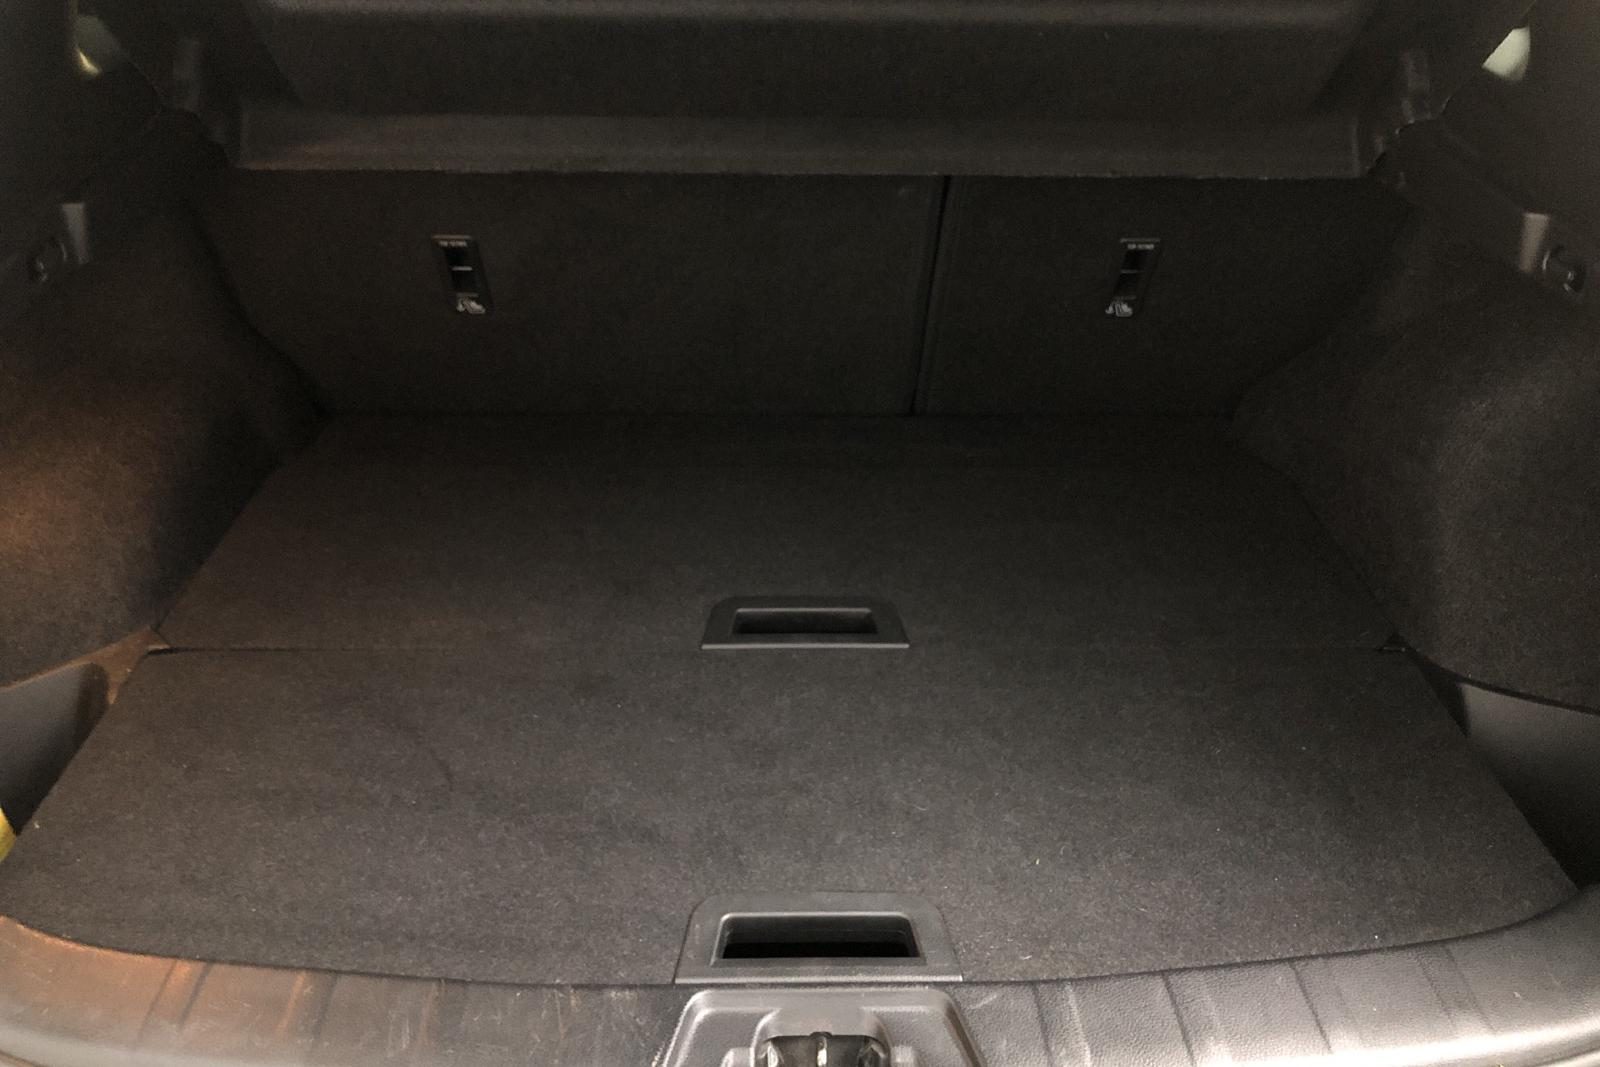 Nissan Qashqai 1.6 dCi (130hk) - 7 259 mil - Automat - vit - 2015